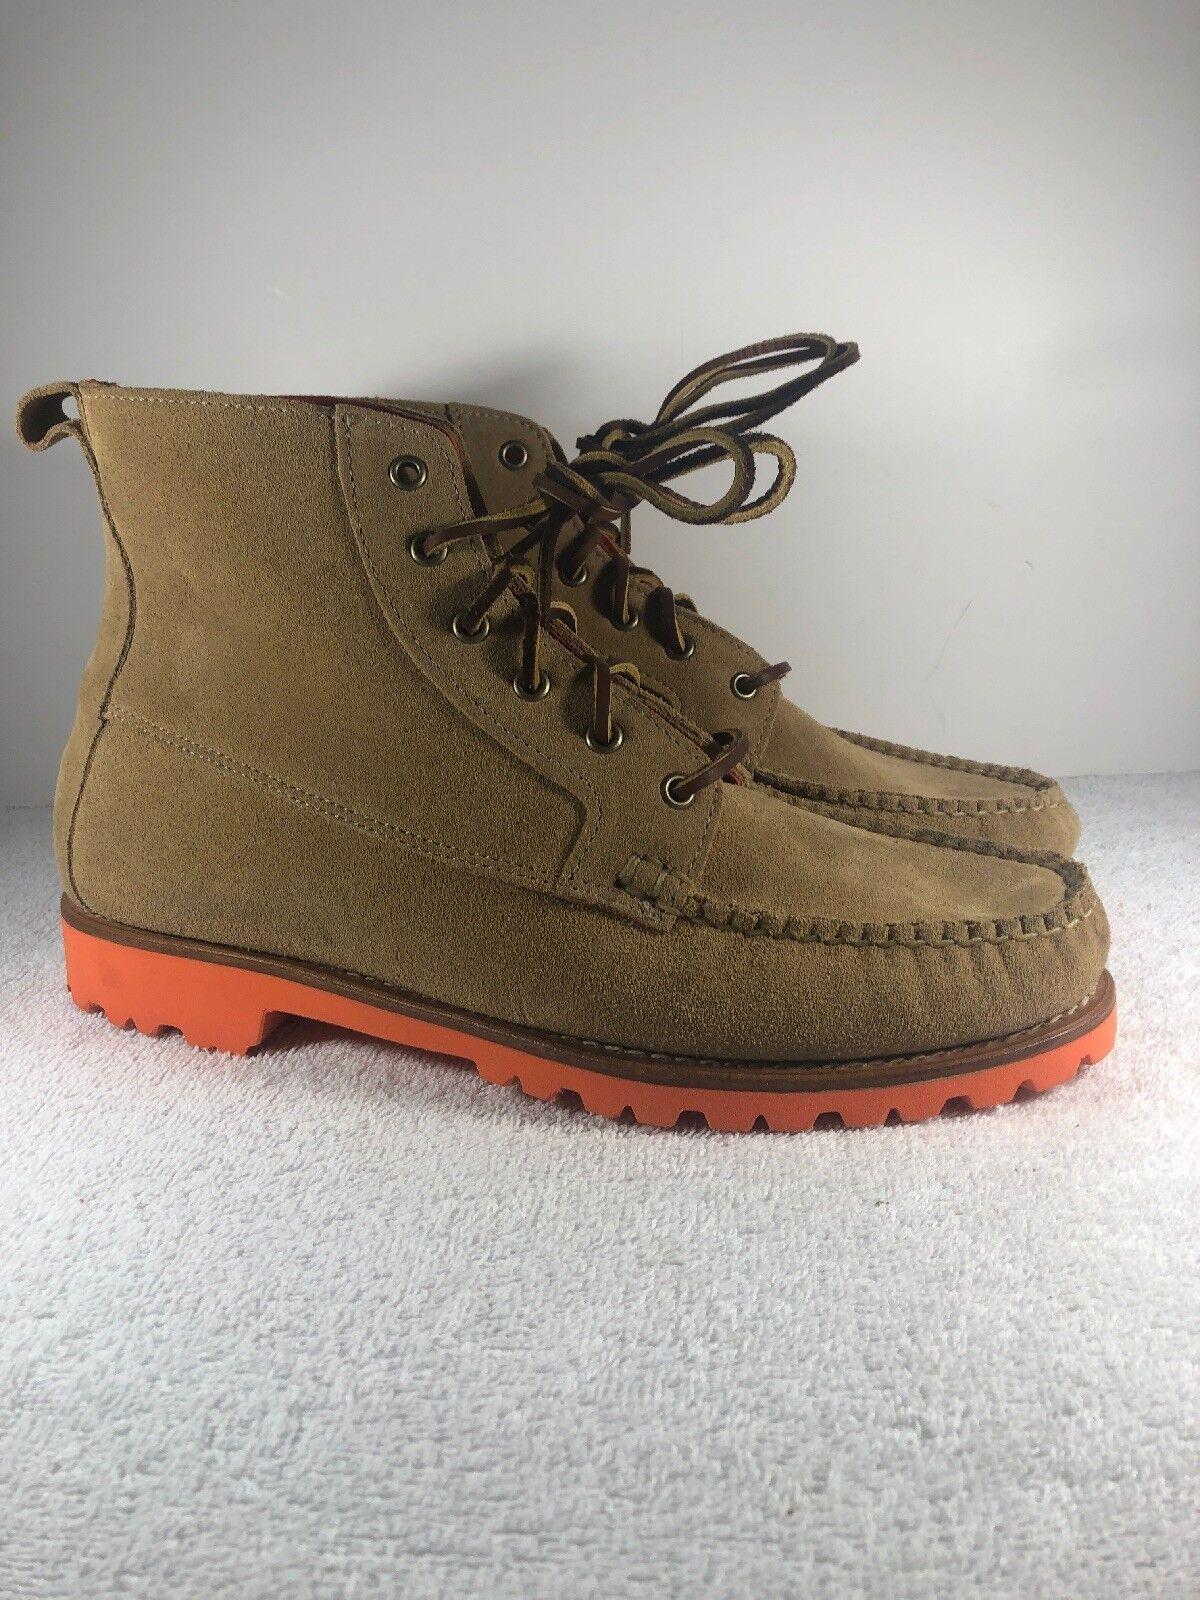 Ralph Lauren Suede Kahki Boots Mens SZ 11 Made In USA orange Vibram Soles